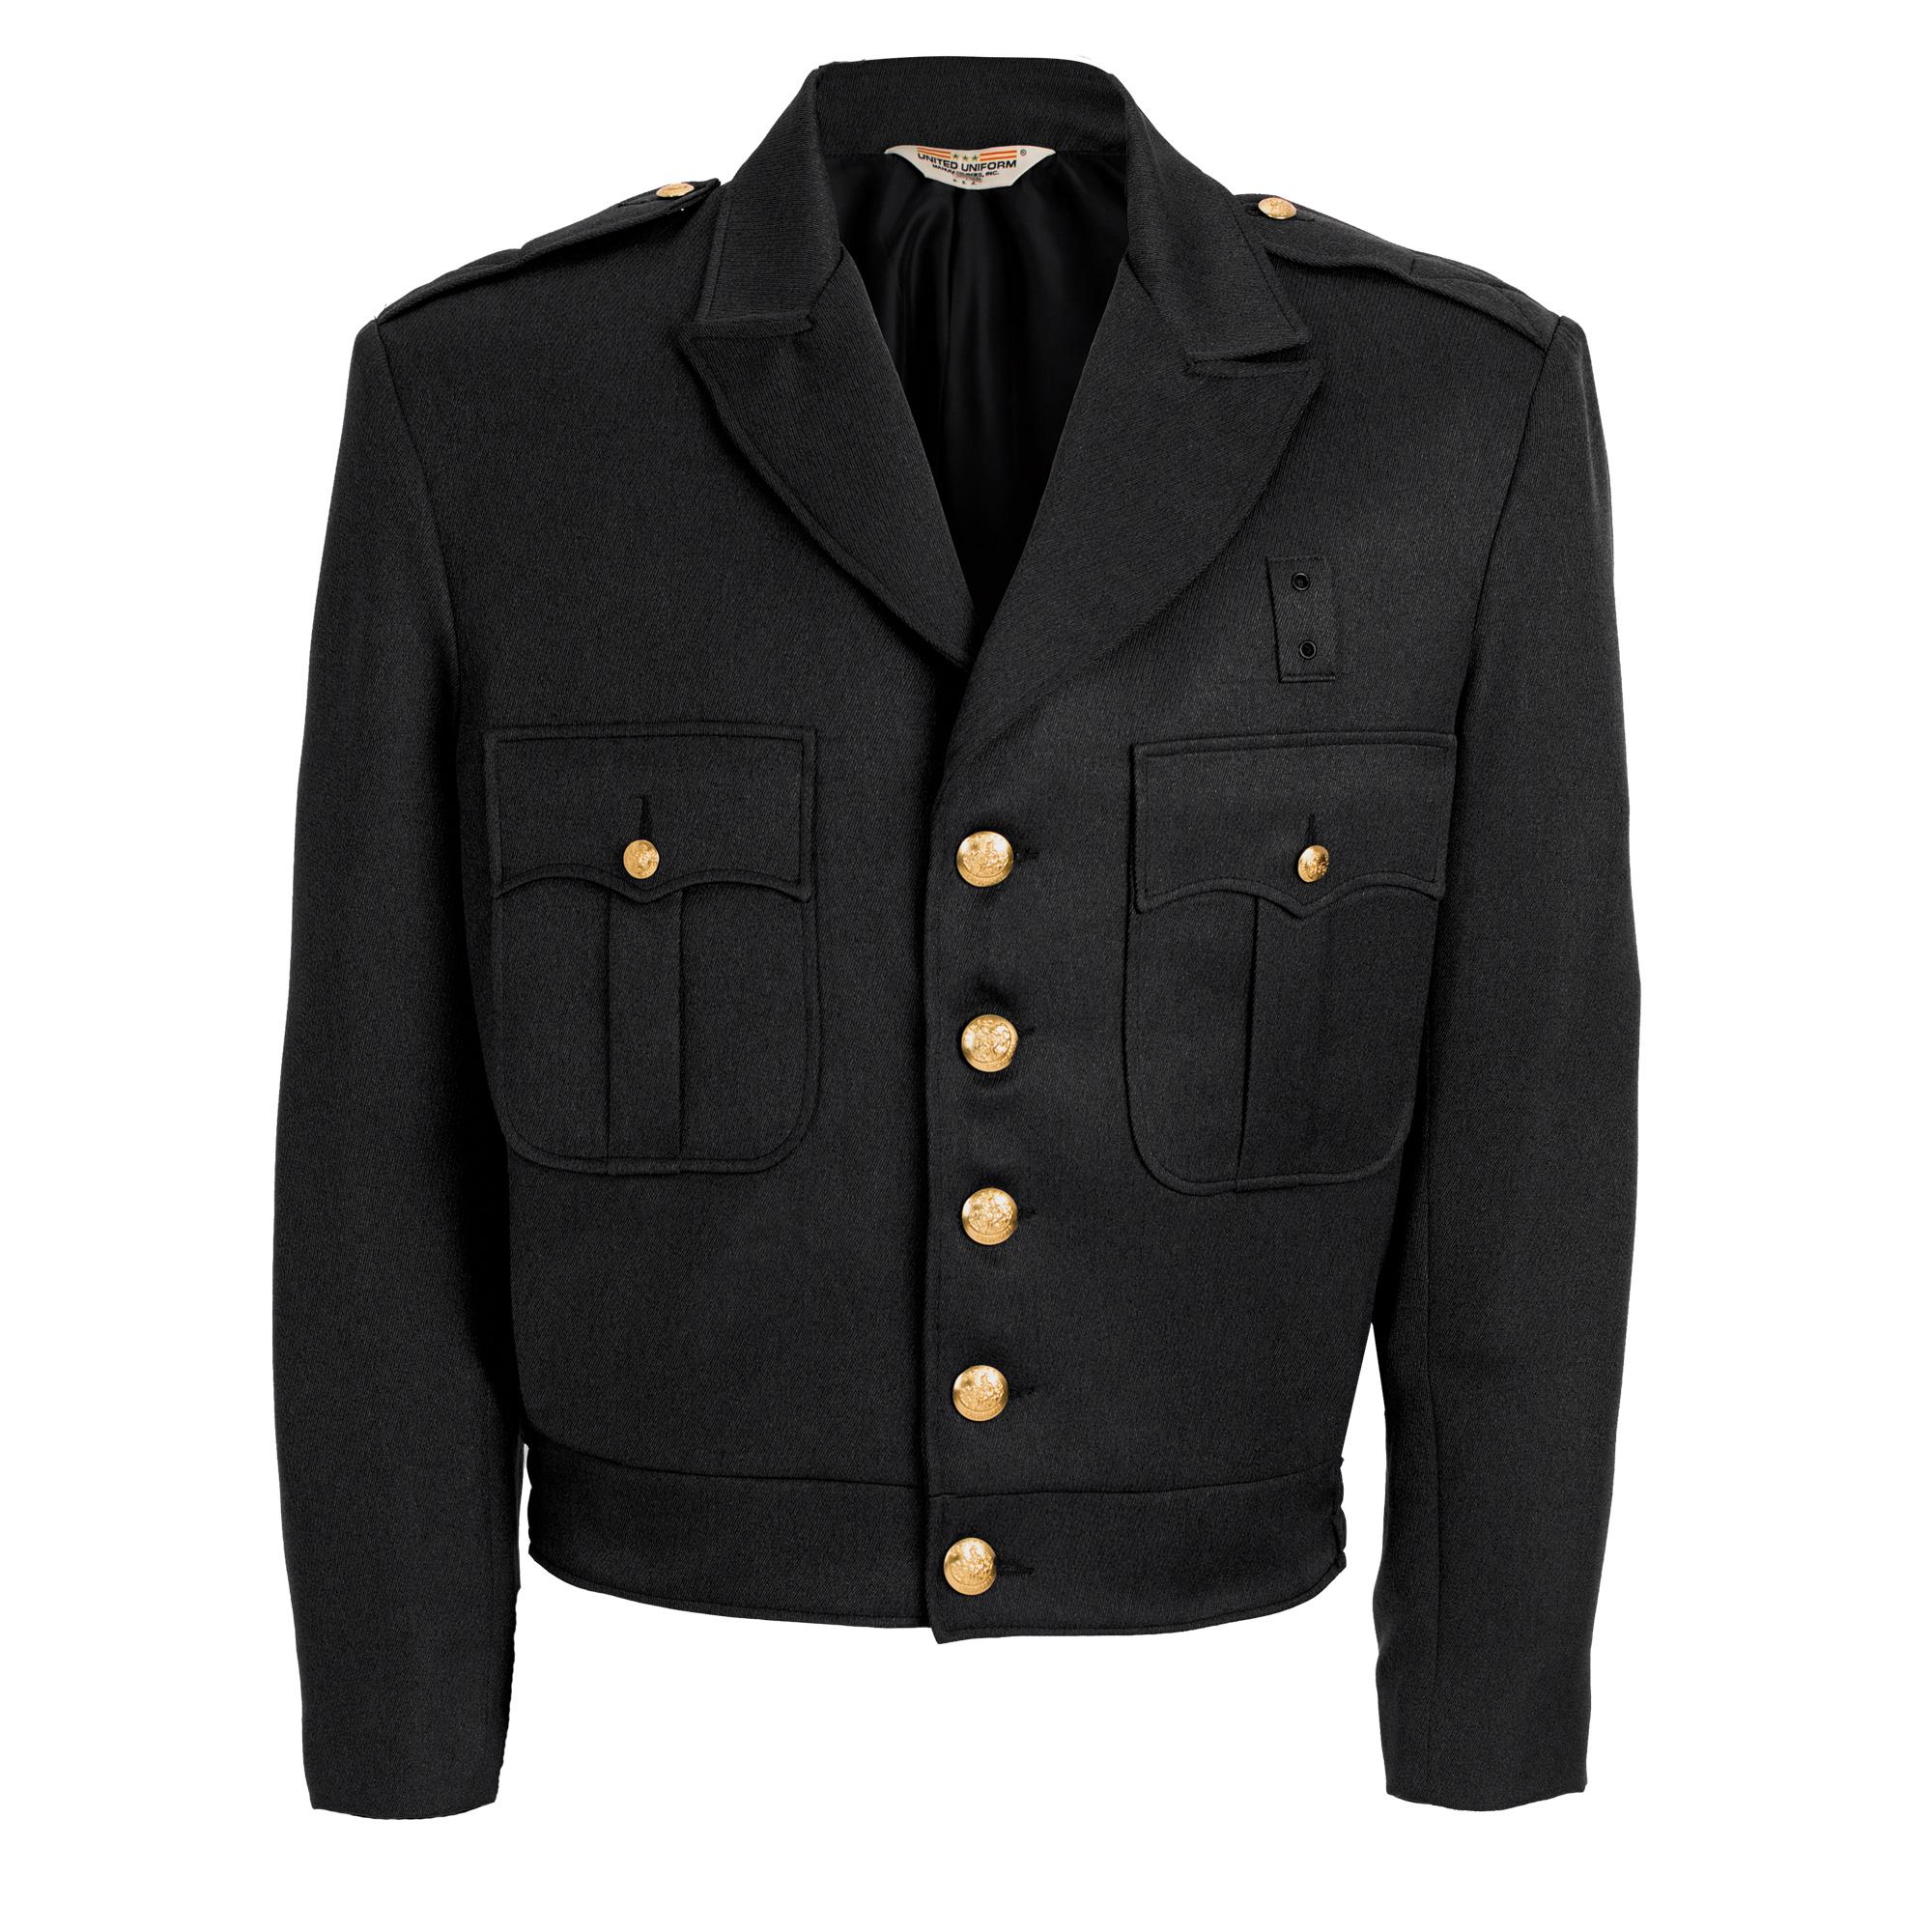 100% Polyester Black Button Up Ike Jacket